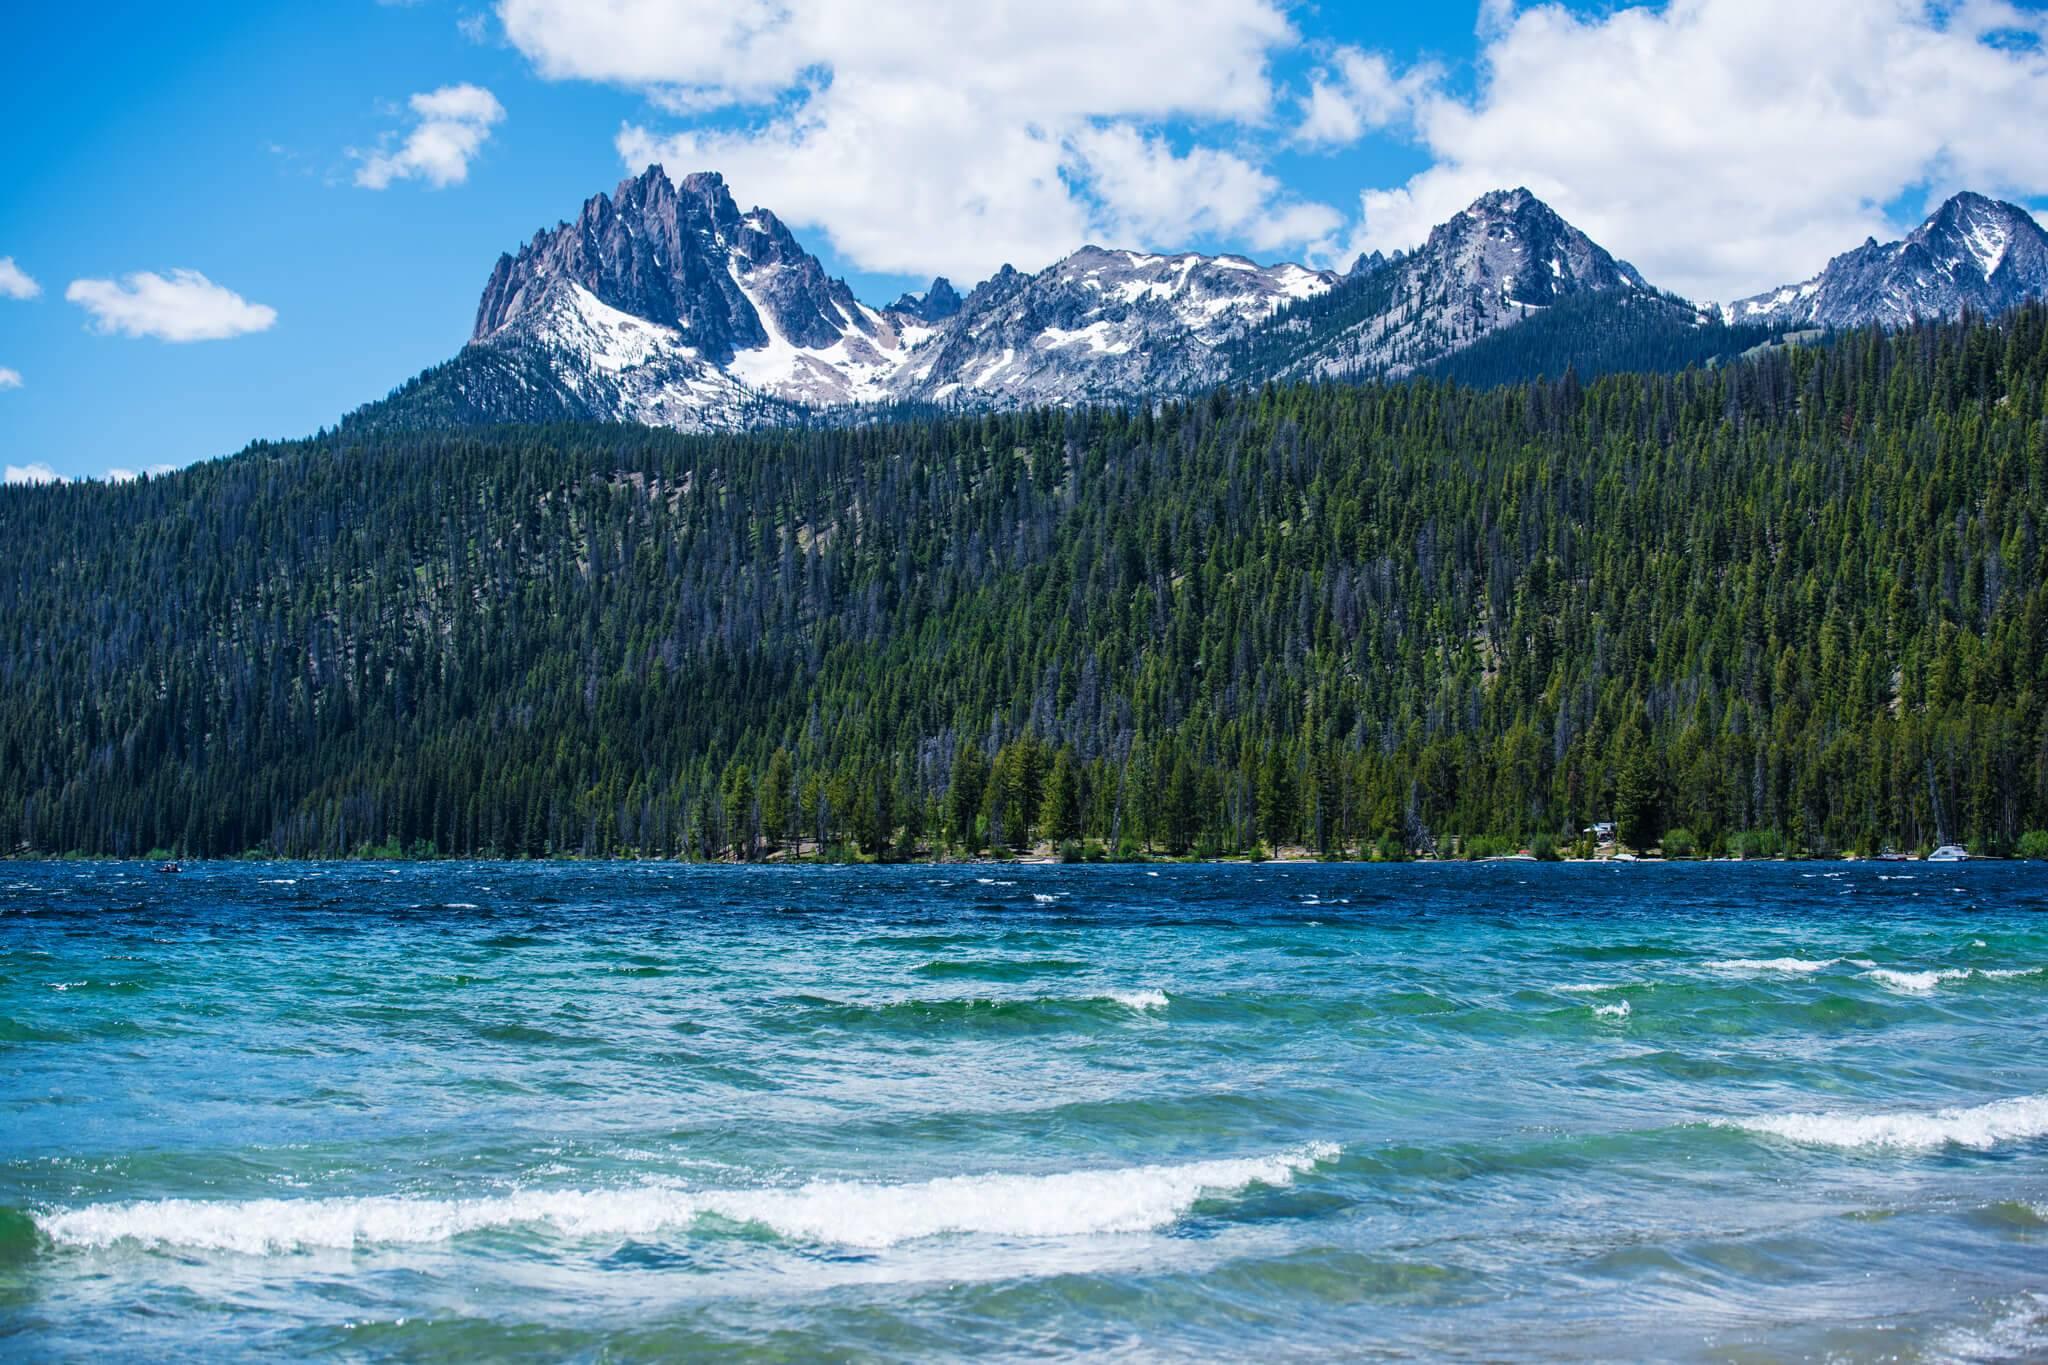 Waves crash on the beach of Redfish Lake. Photo Credit: Idaho Tourism